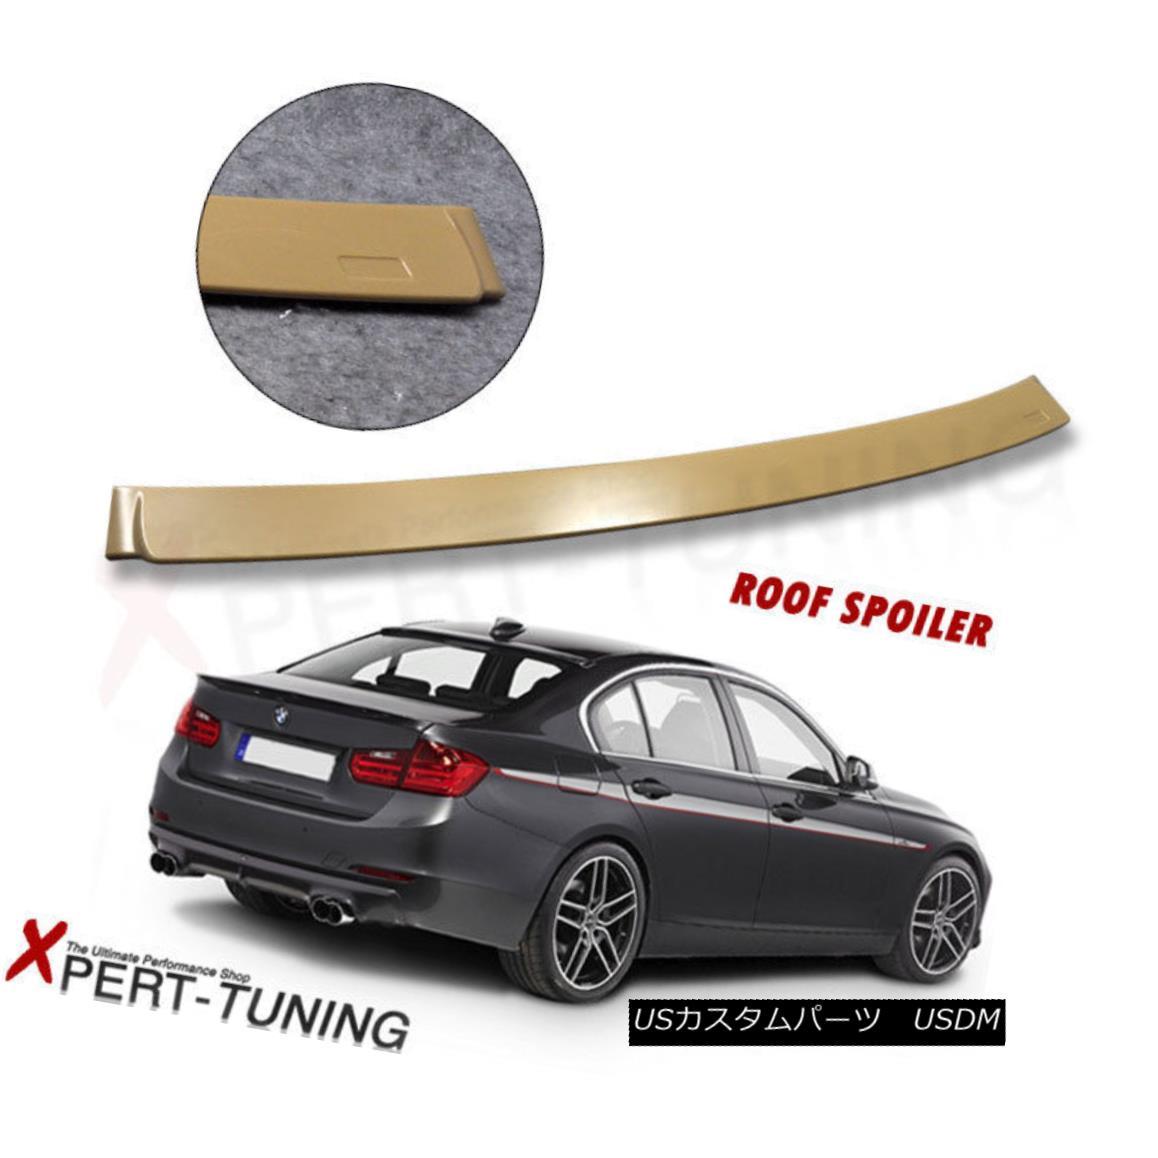 Fits BMW F30 12-18 3 Series 320i 328i 335i 4Dr Sedan ABS Trunk Spoiler Wing